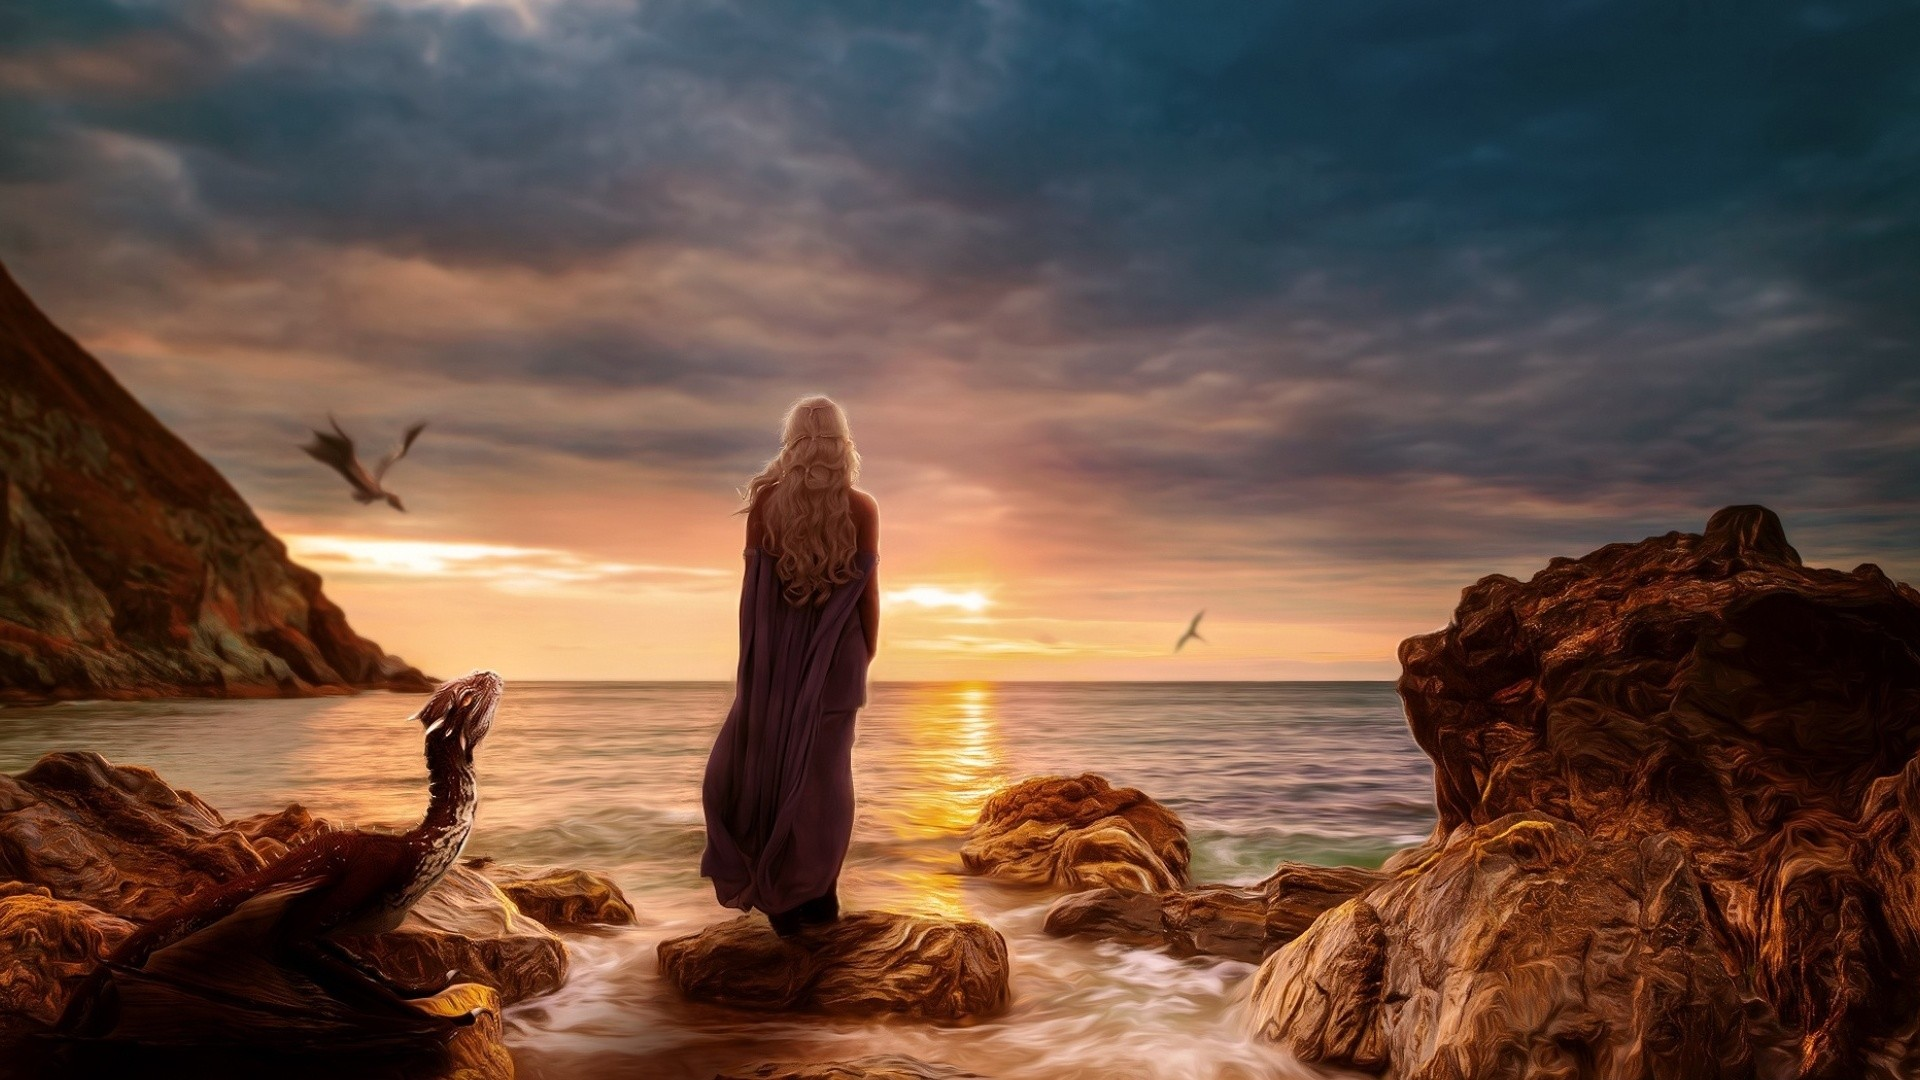 59 Daenerys Targaryen HD Wallpapers